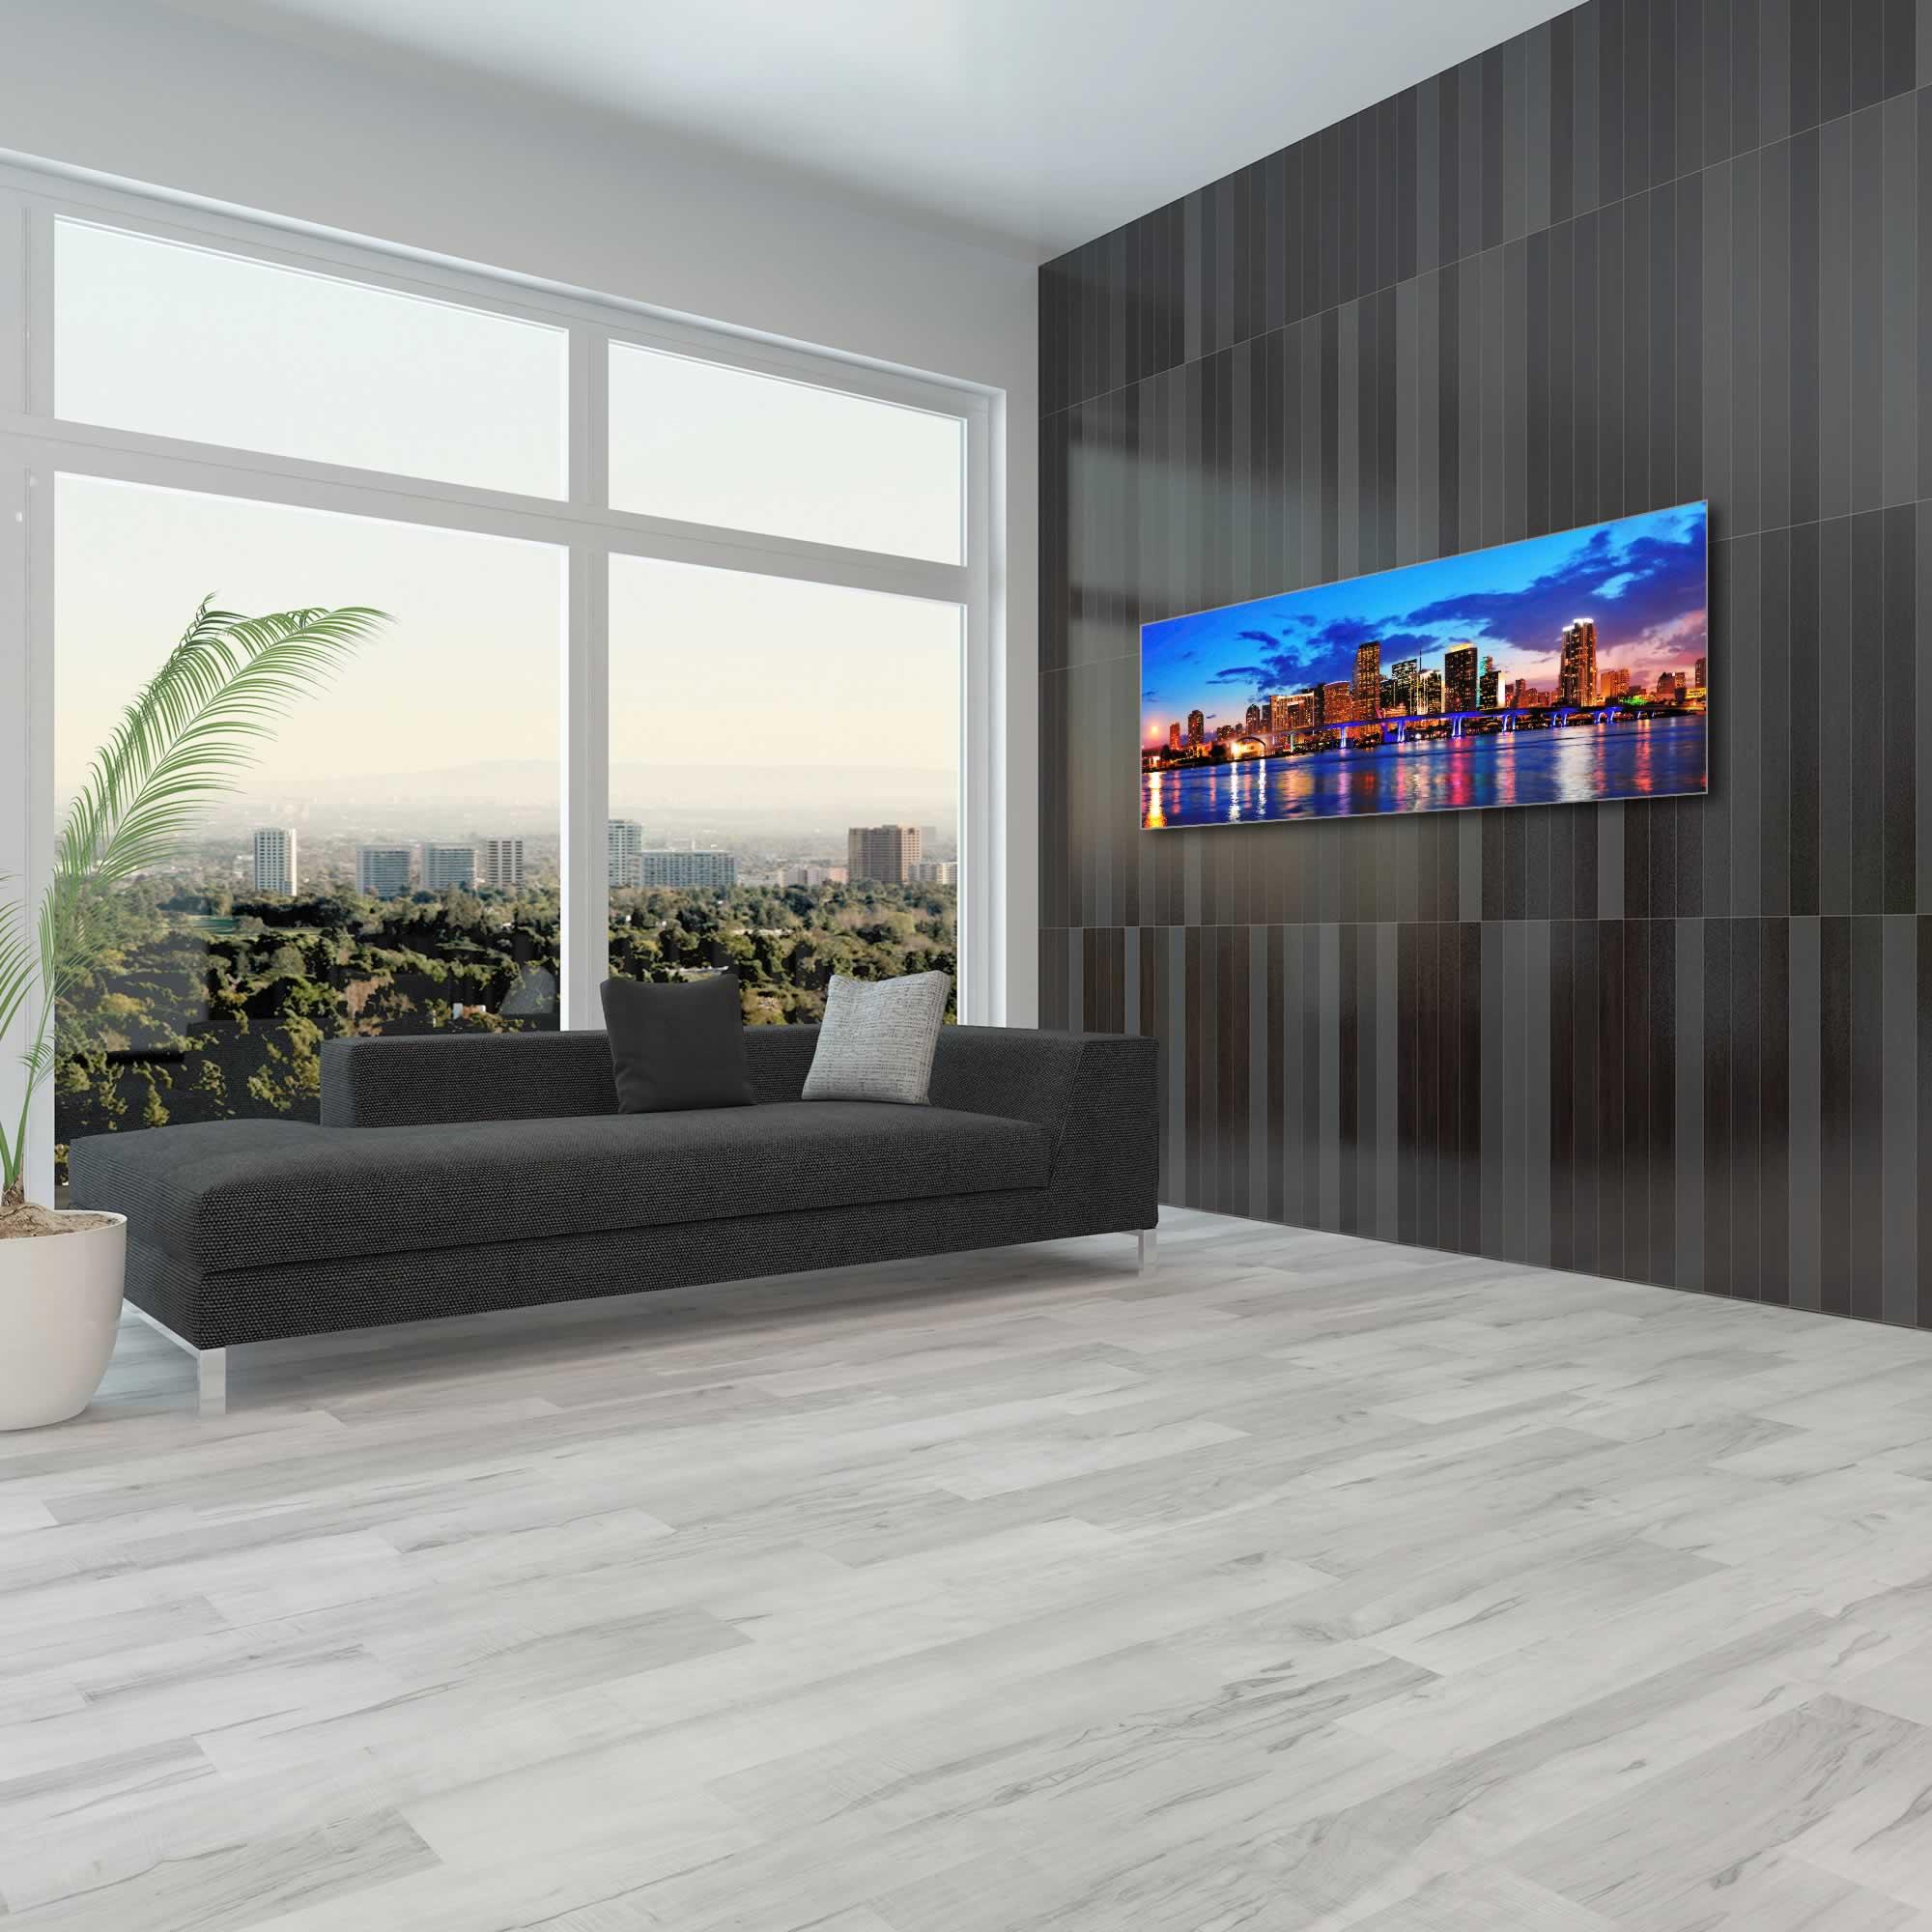 Miami City Skyline - Urban Modern Art, Designer Home Decor, Cityscape Wall Artwork, Trendy Contemporary Art - Alternate View 1